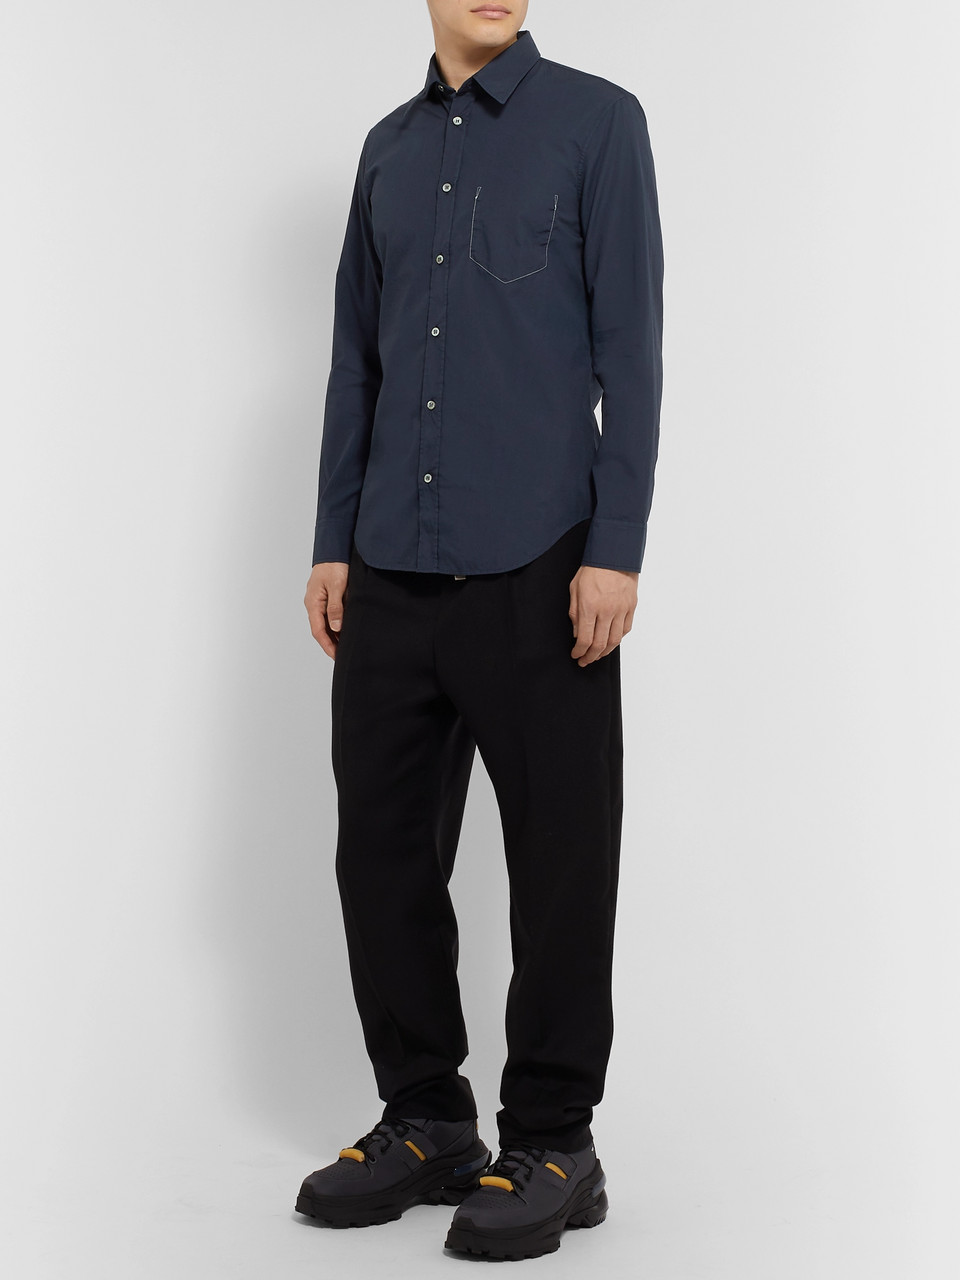 8085e759c Casual Shirts for Men | Designer Menswear | MR PORTER